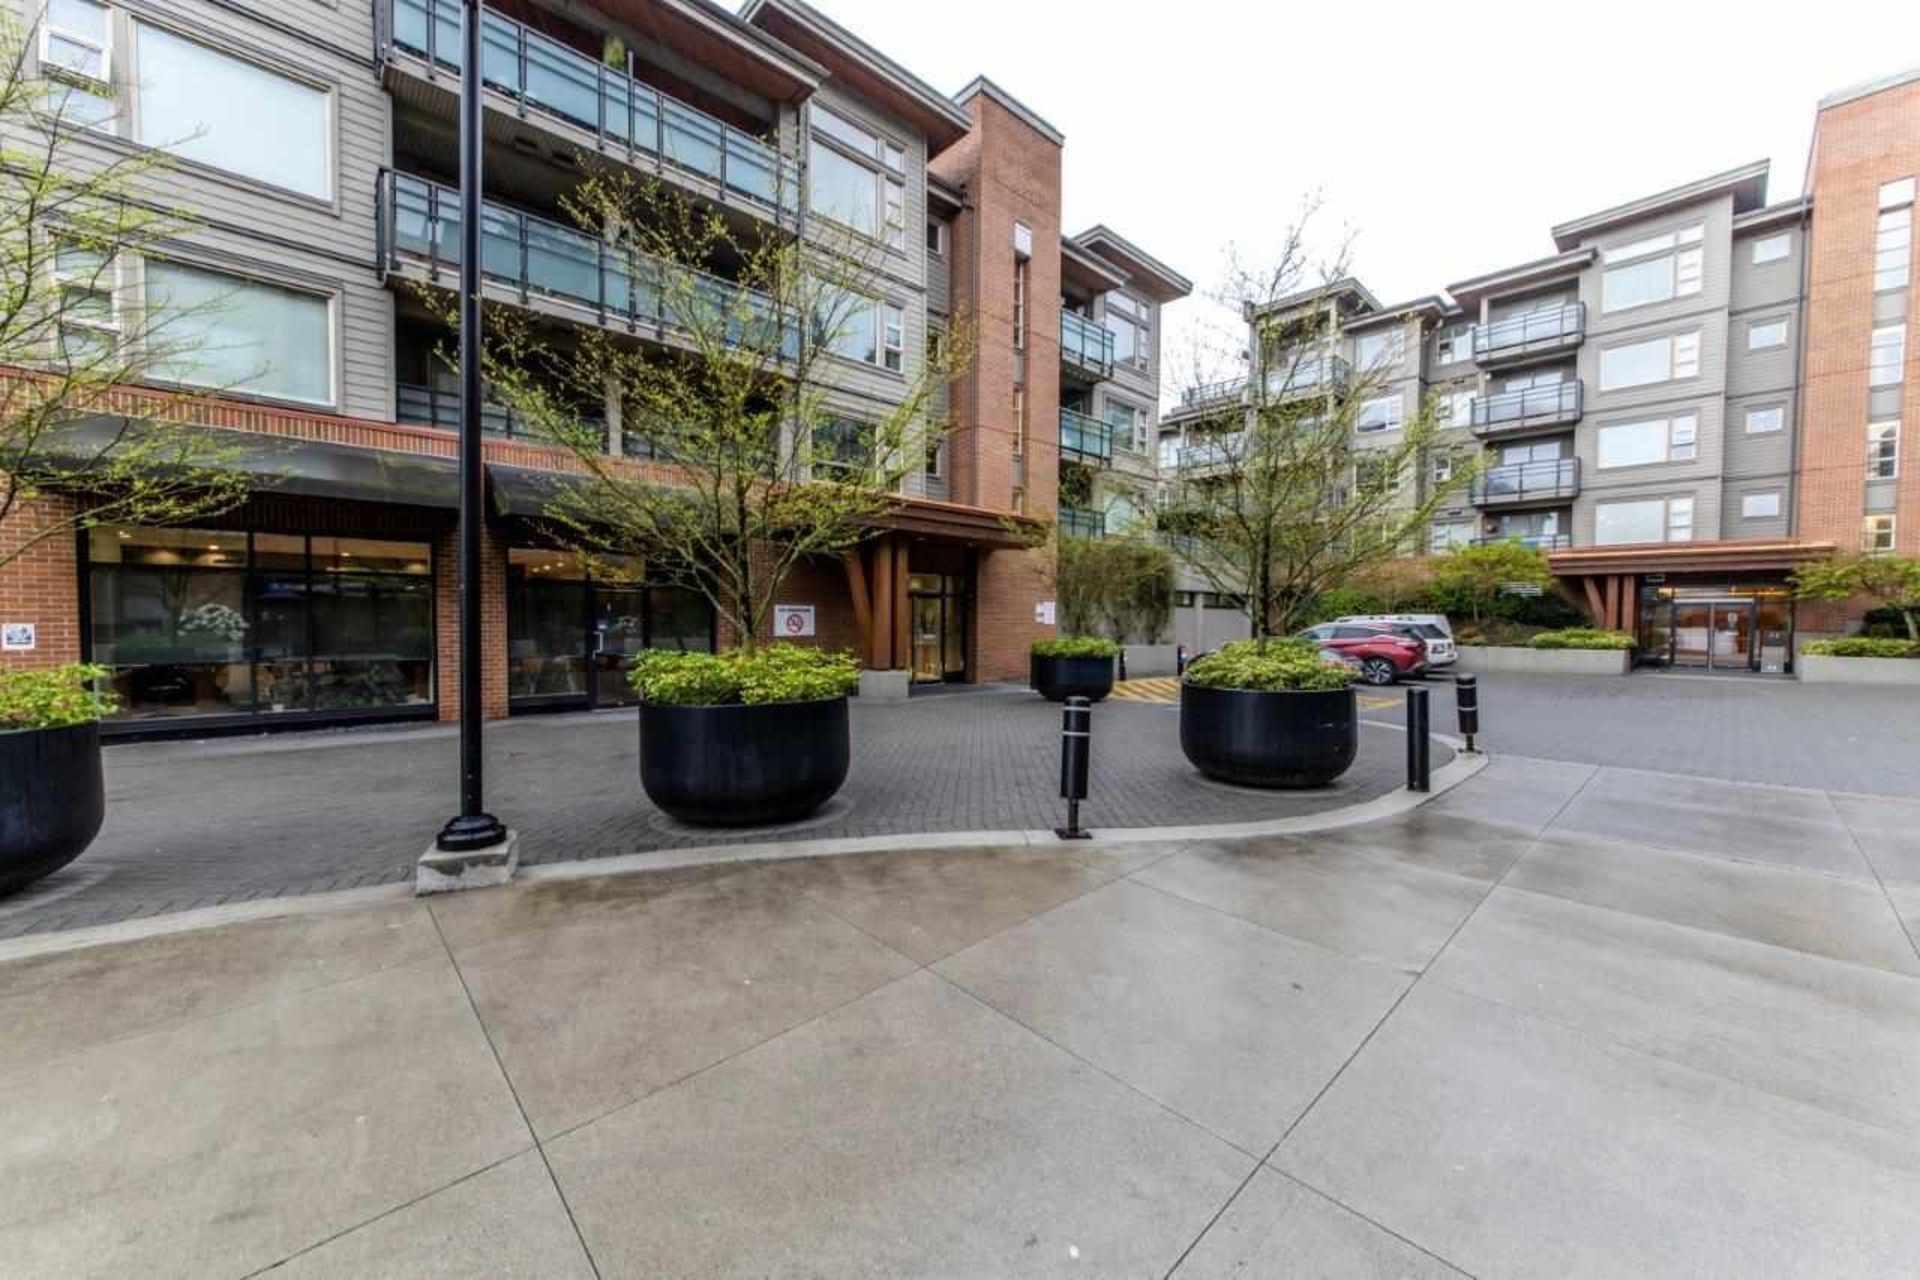 1673-lloyd-avenue-pemberton-nv-north-vancouver-25 at 307 - 1673 Lloyd Avenue, Pemberton NV, North Vancouver